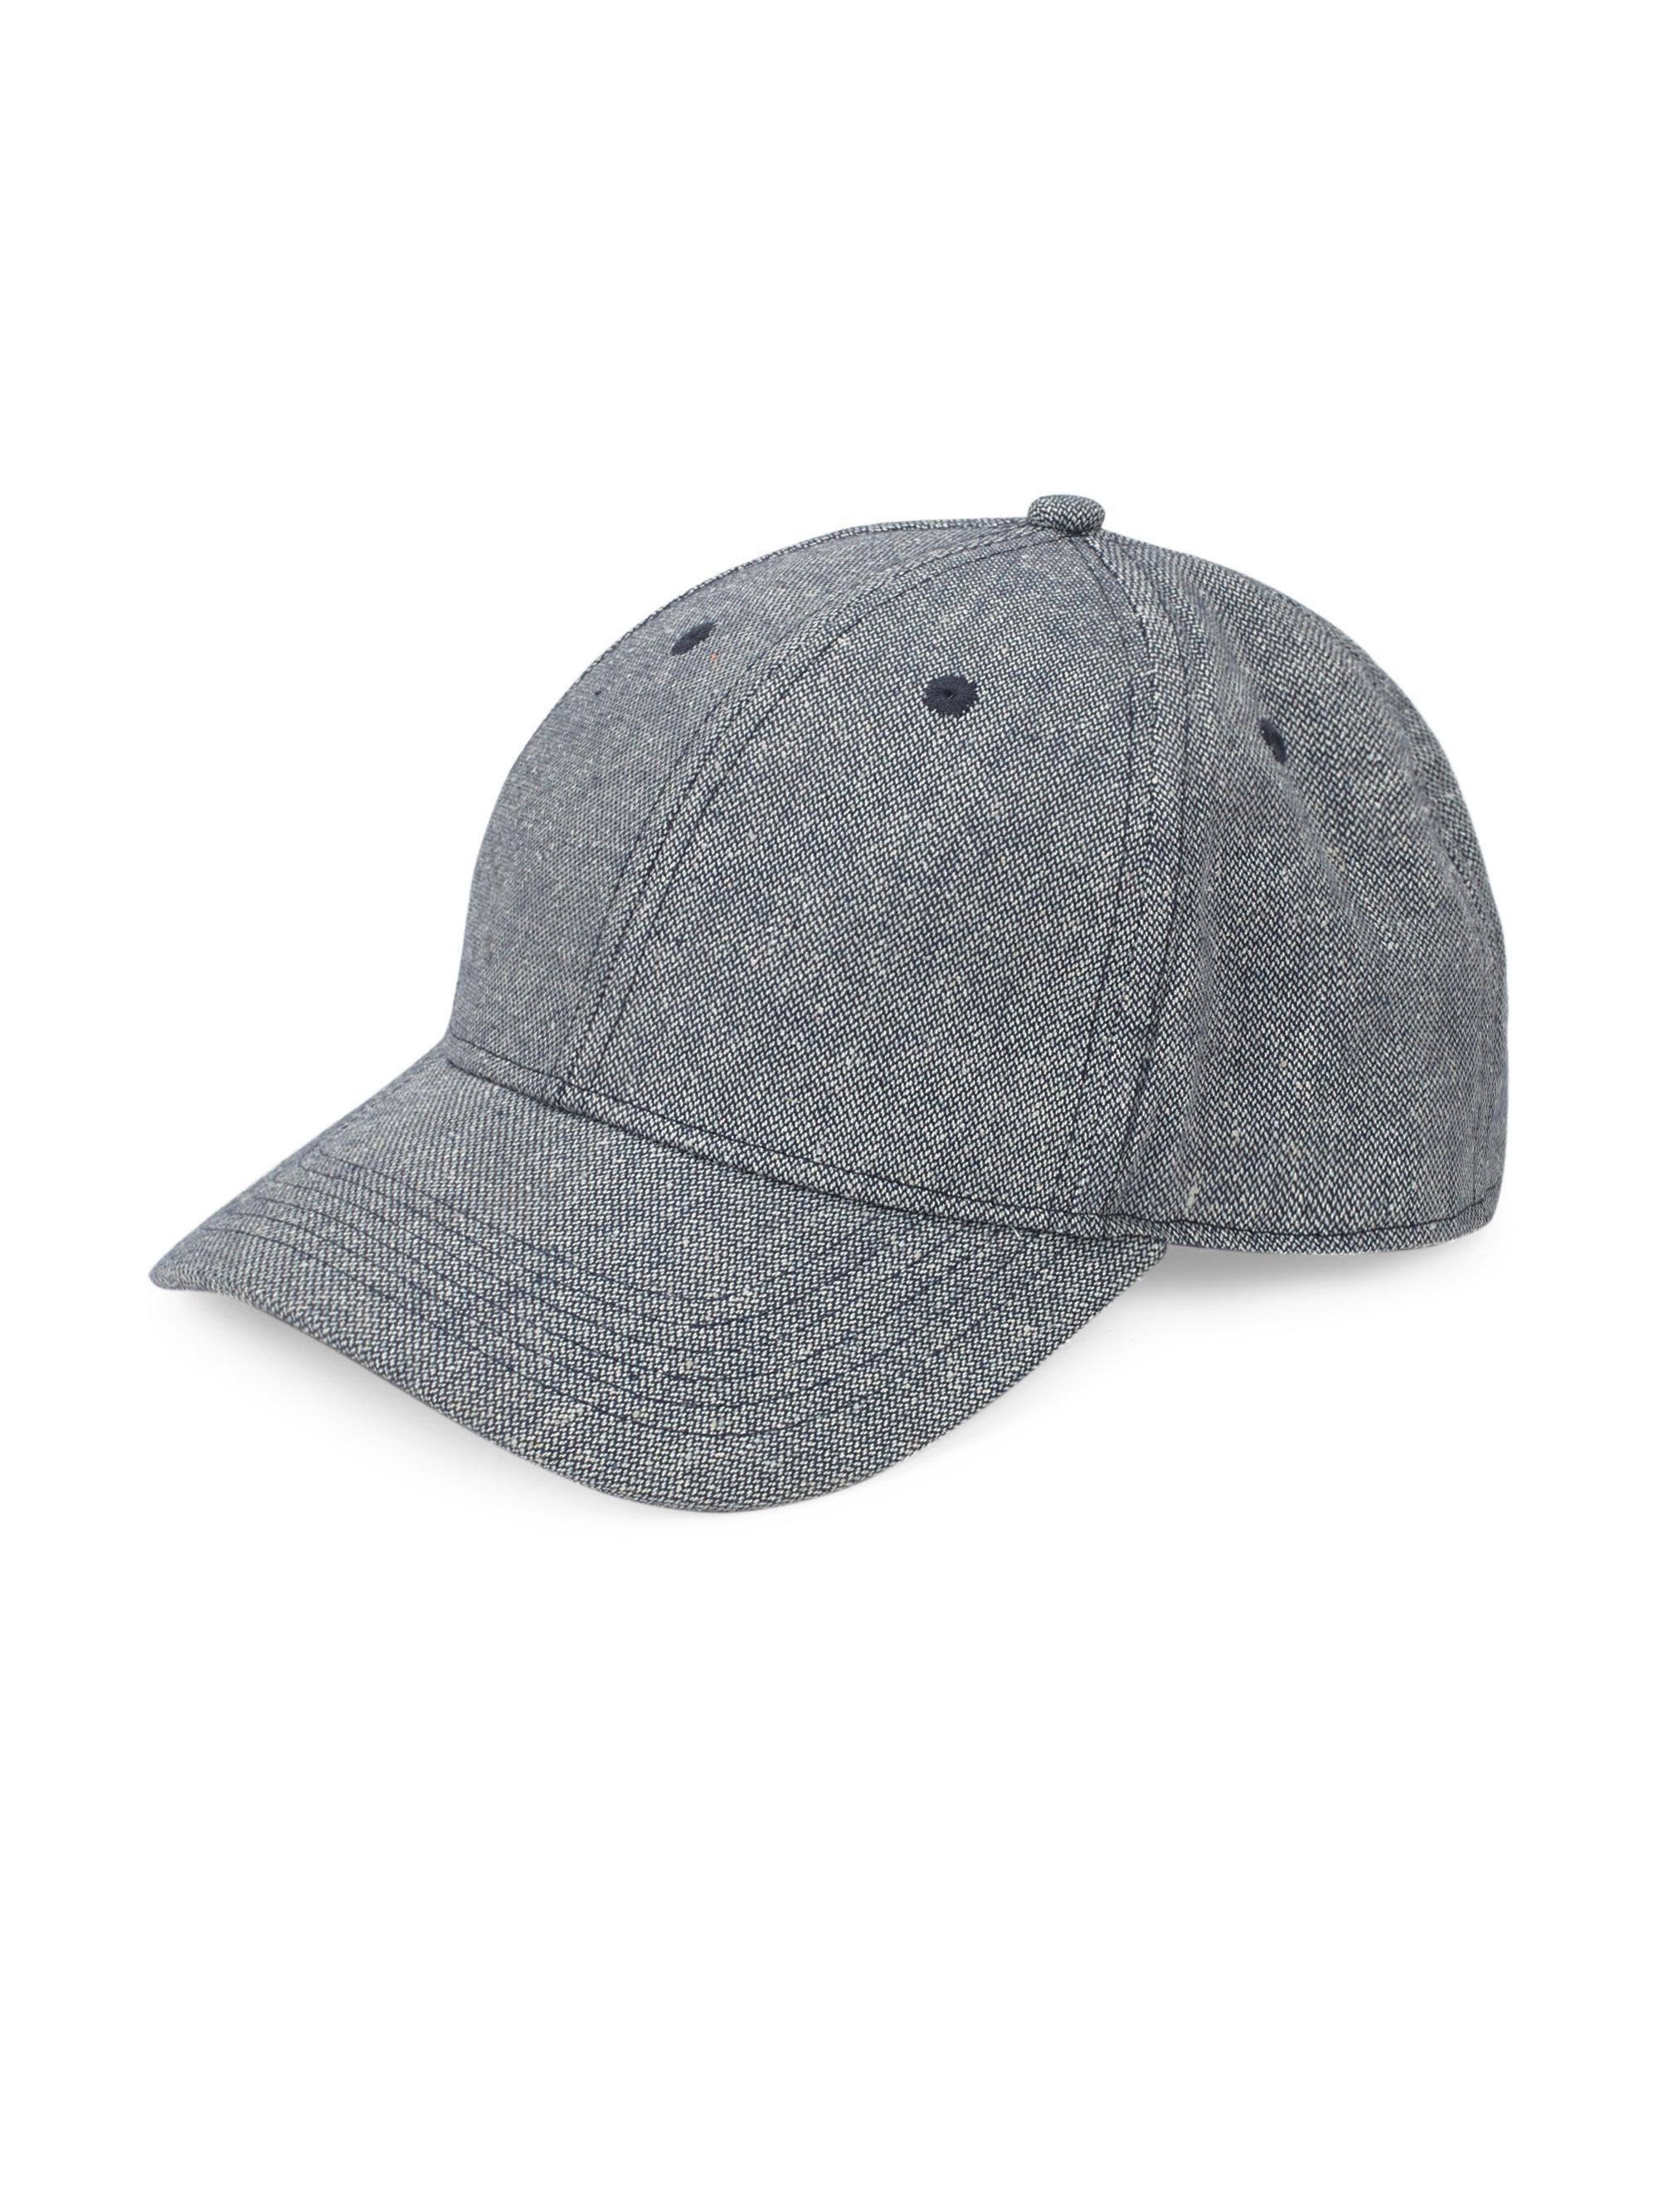 b6b9068d0a9 Gents Executive Hemp Baseball Cap in Gray for Men - Lyst